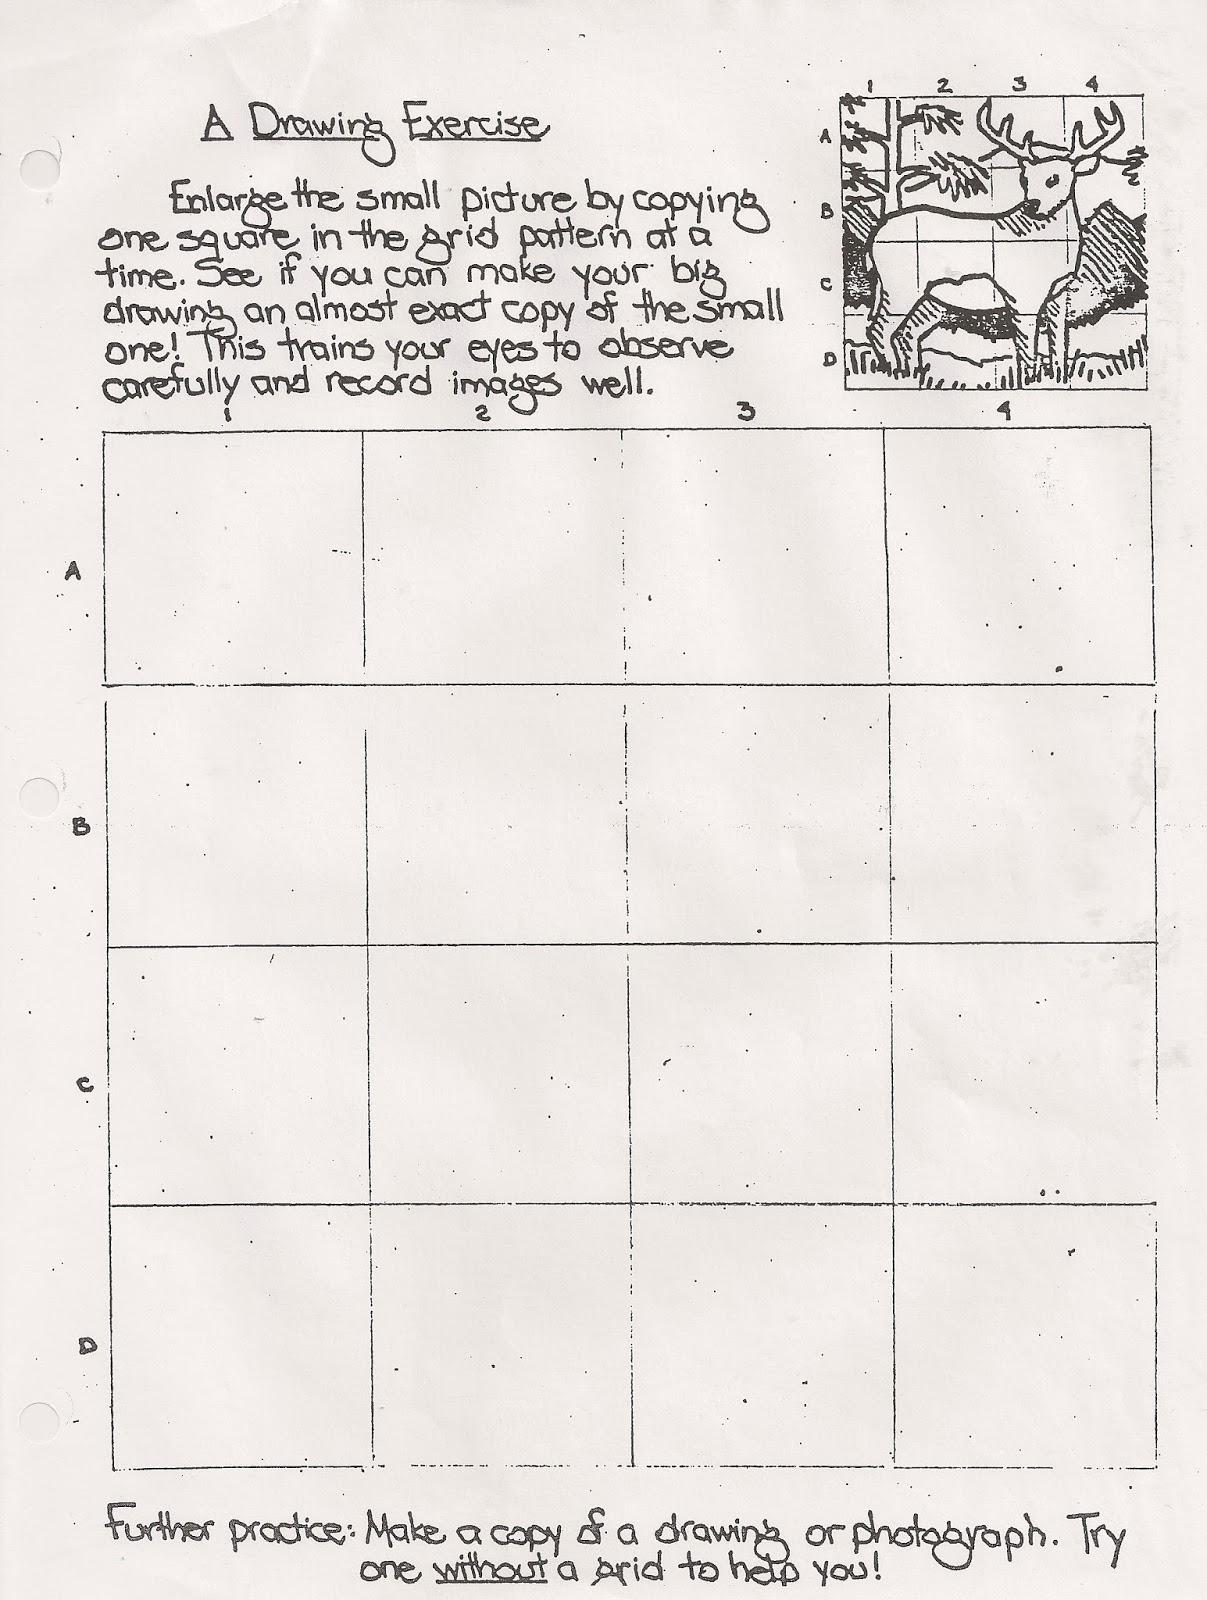 No Corner Suns Drawing Exercise Worksheet Handout Useful